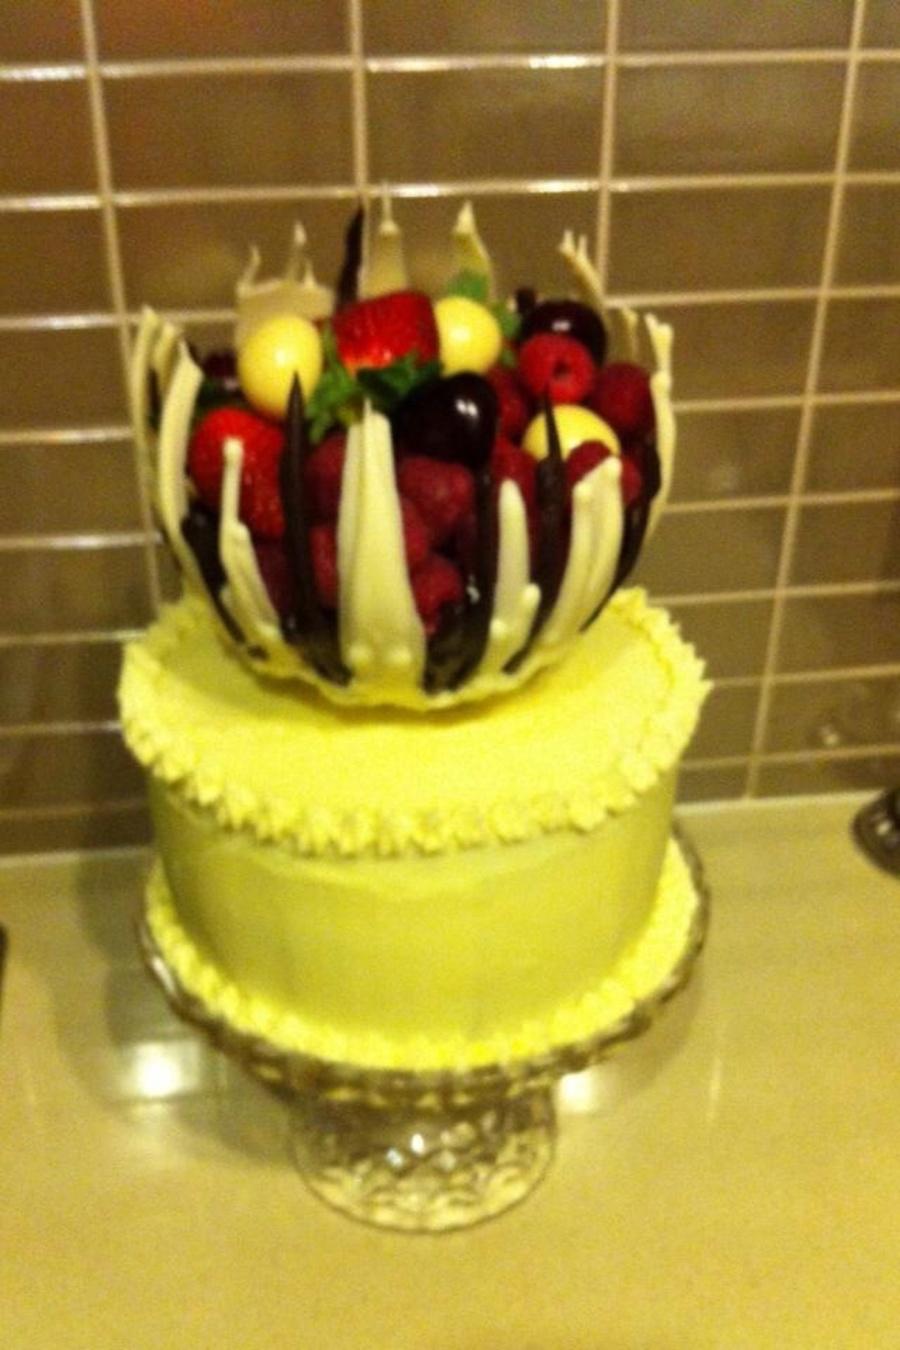 White Choc Mud Cake With Choc Fruit Filled Bowl